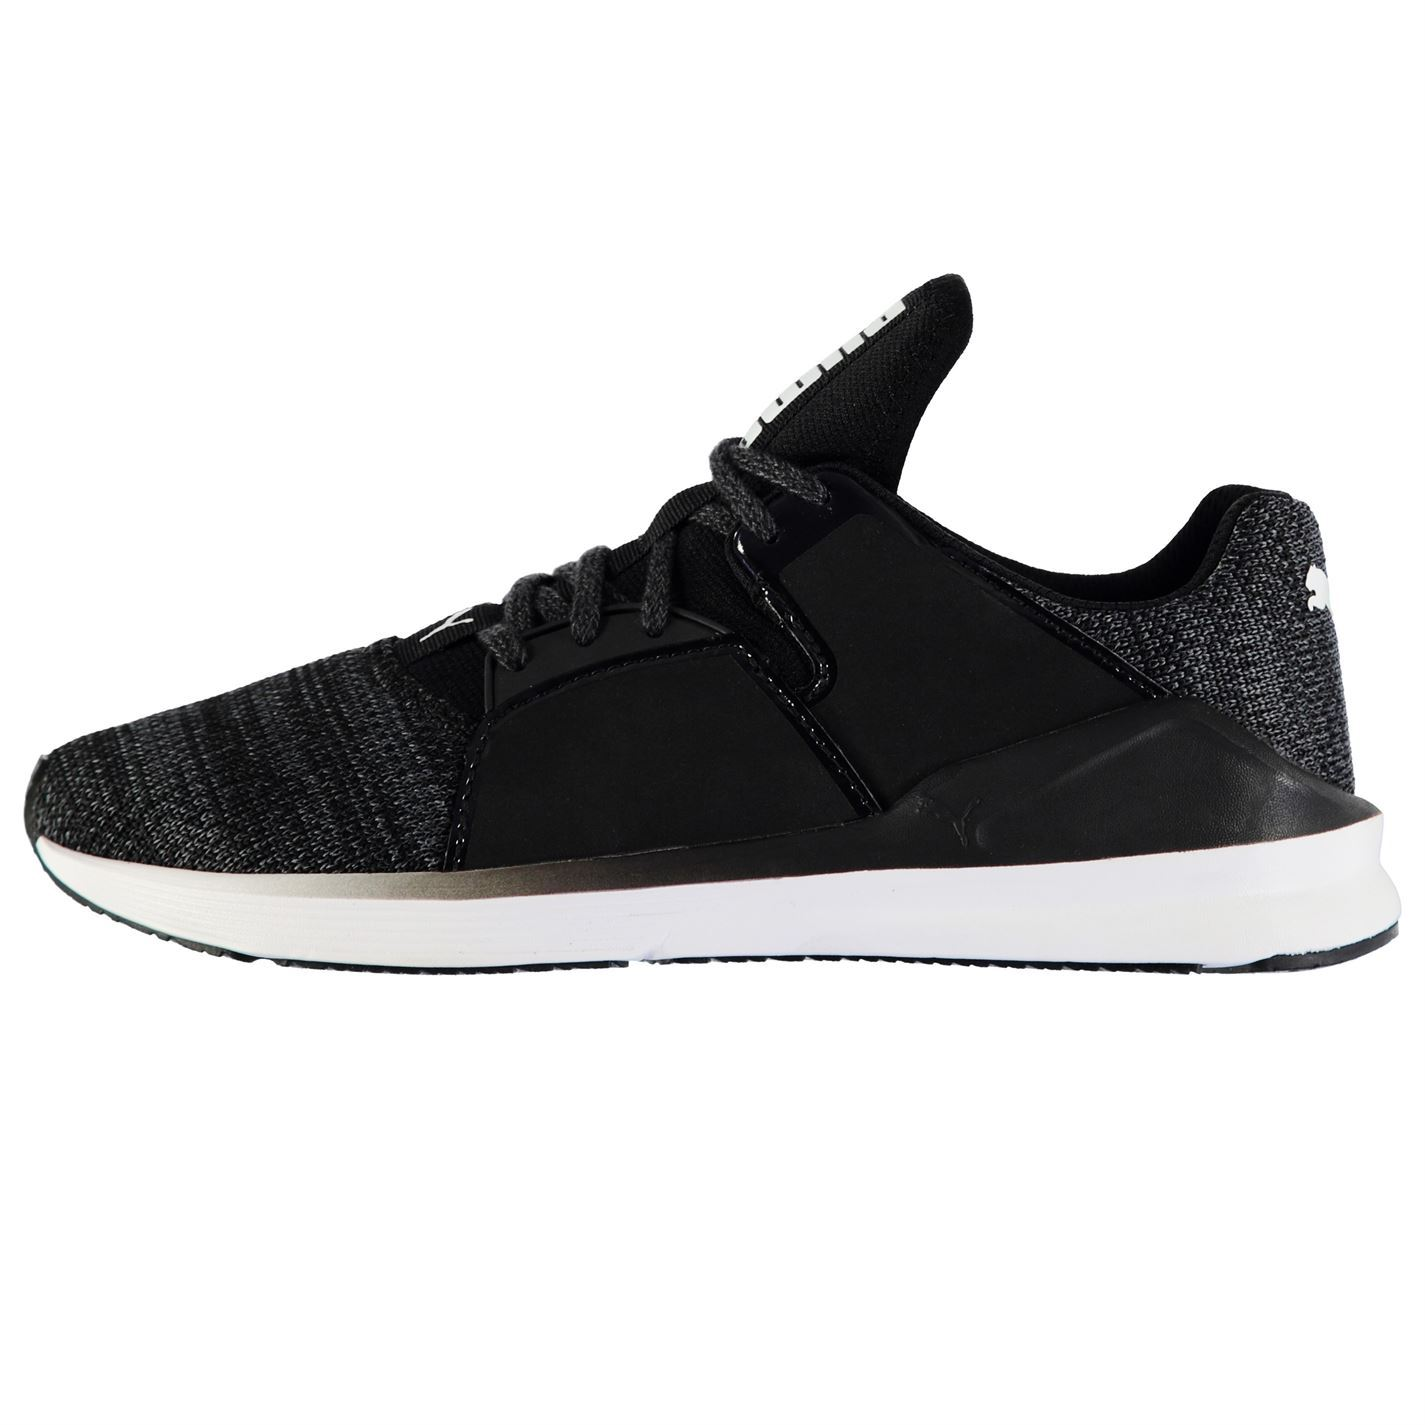 9616c2b8ebf6 ... Puma Fierce Knit Running Shoes Womens Black White Run Jogging Trainers  Sneakers ...